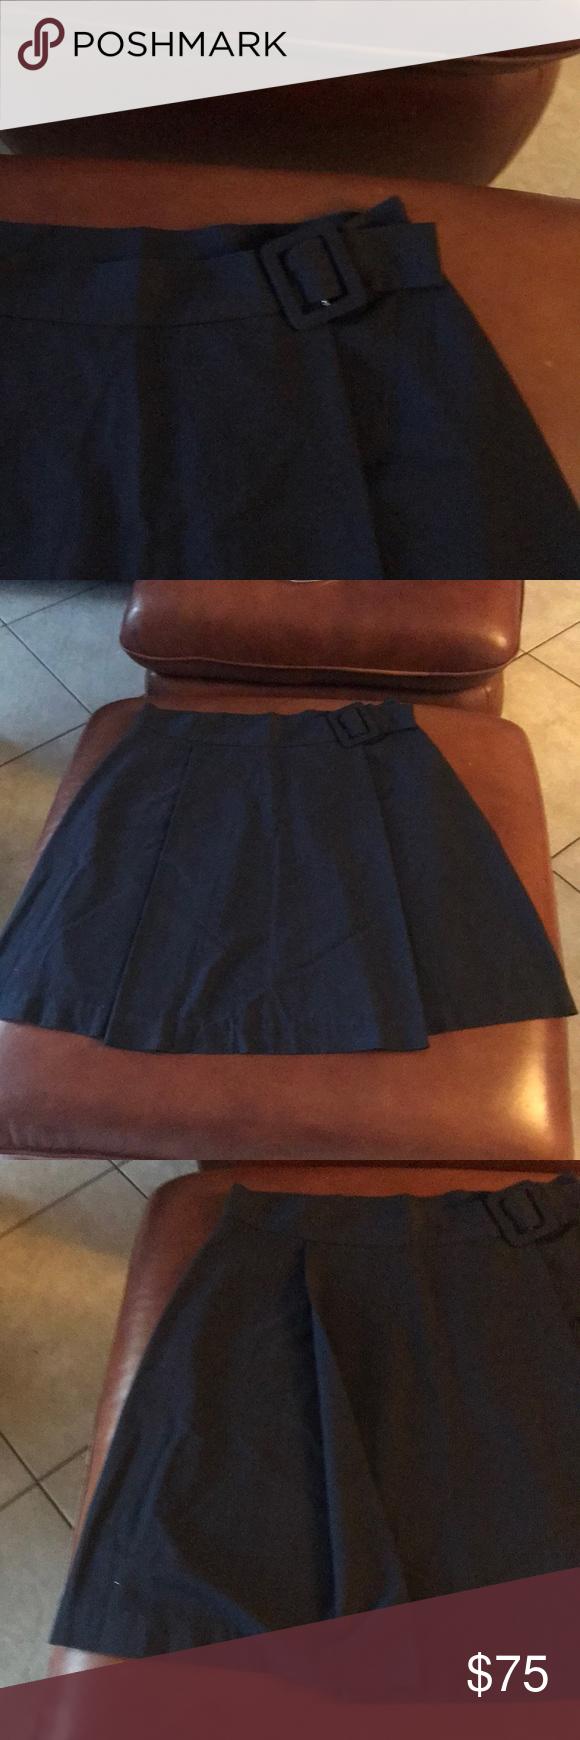 Mini skirts in france V A The Miniskirt Myth